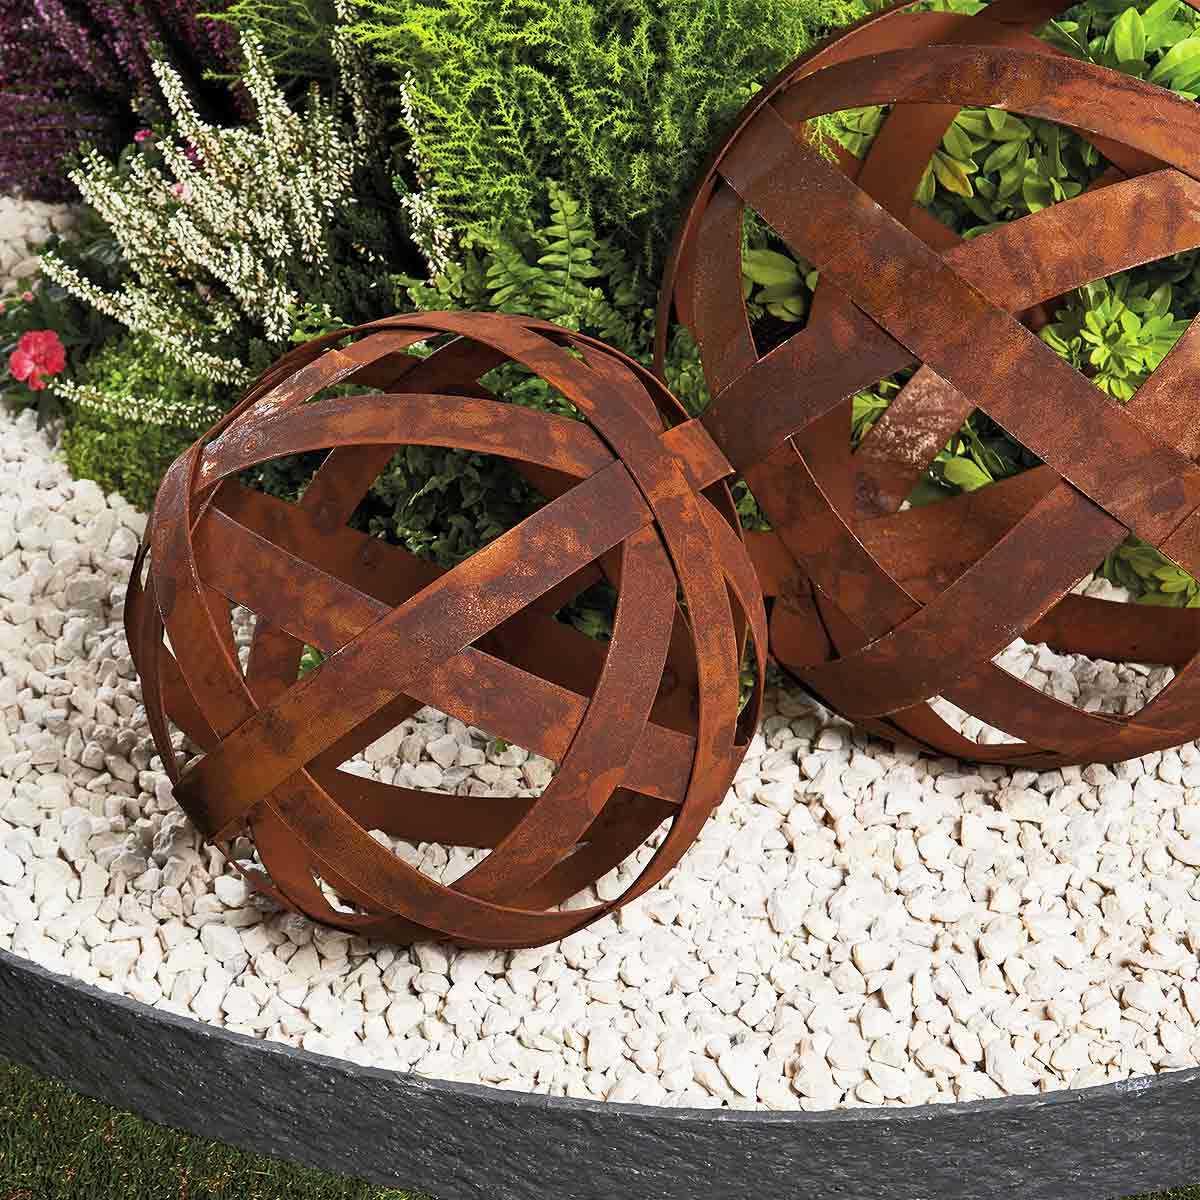 boule a arceaux deco jardin en metal vente au meilleur prix jardins animes